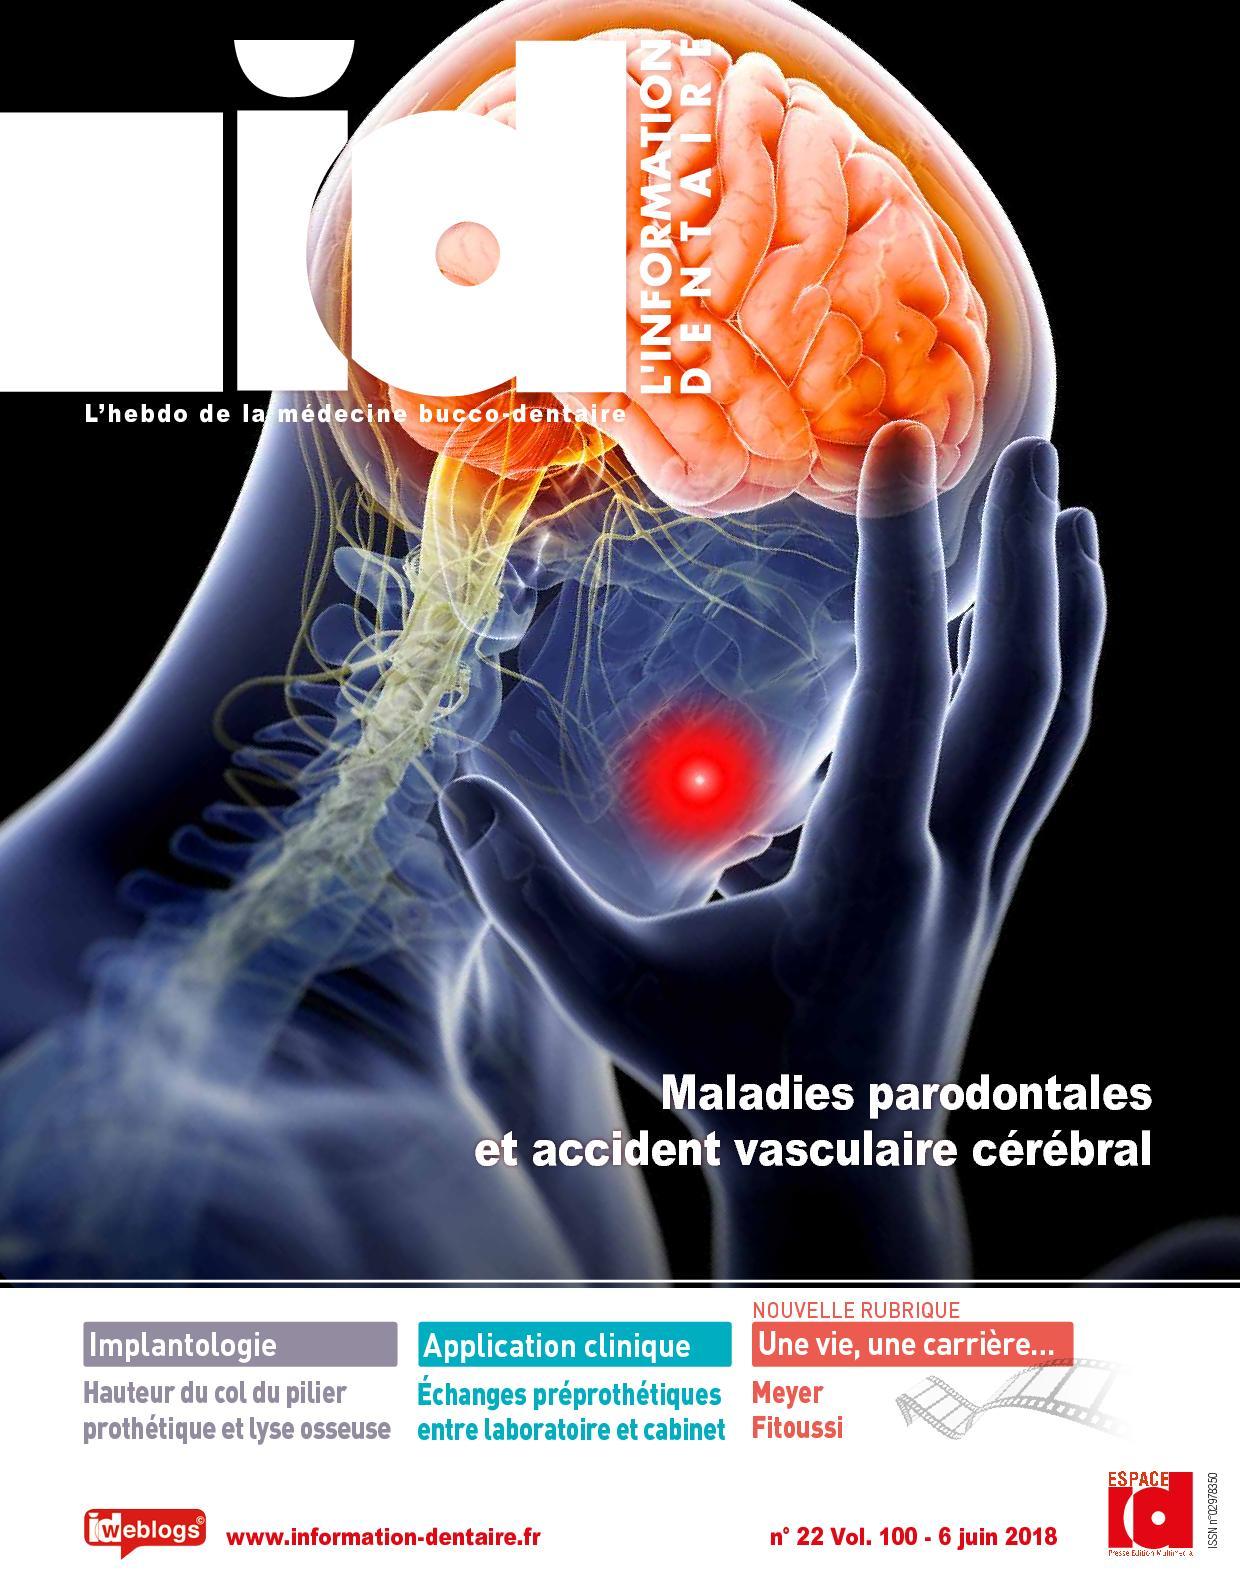 Information Dentaire ID n°22 Vol.100 - 6 Juin 2018 P111